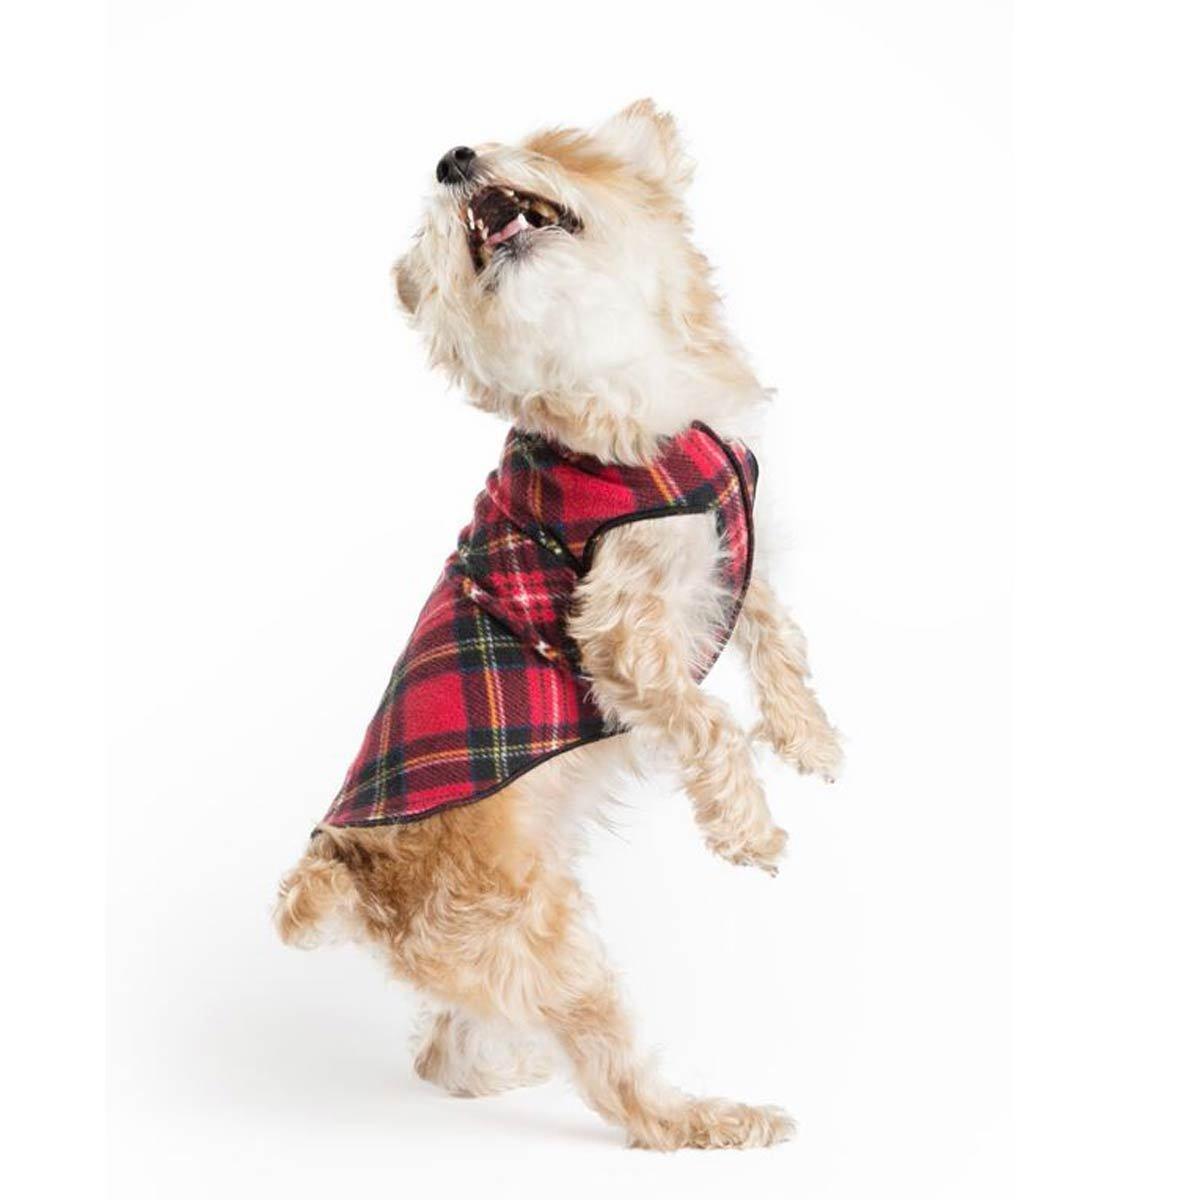 Gold Paw Stretch Blue Fleece Dog Coat - Soft, Warm Dog Clothes, Stretchy Pet Sweater - Machine Washable, Eco Friendly - All Season - Sizes 2-33, Red Classic Plaid, Size 10